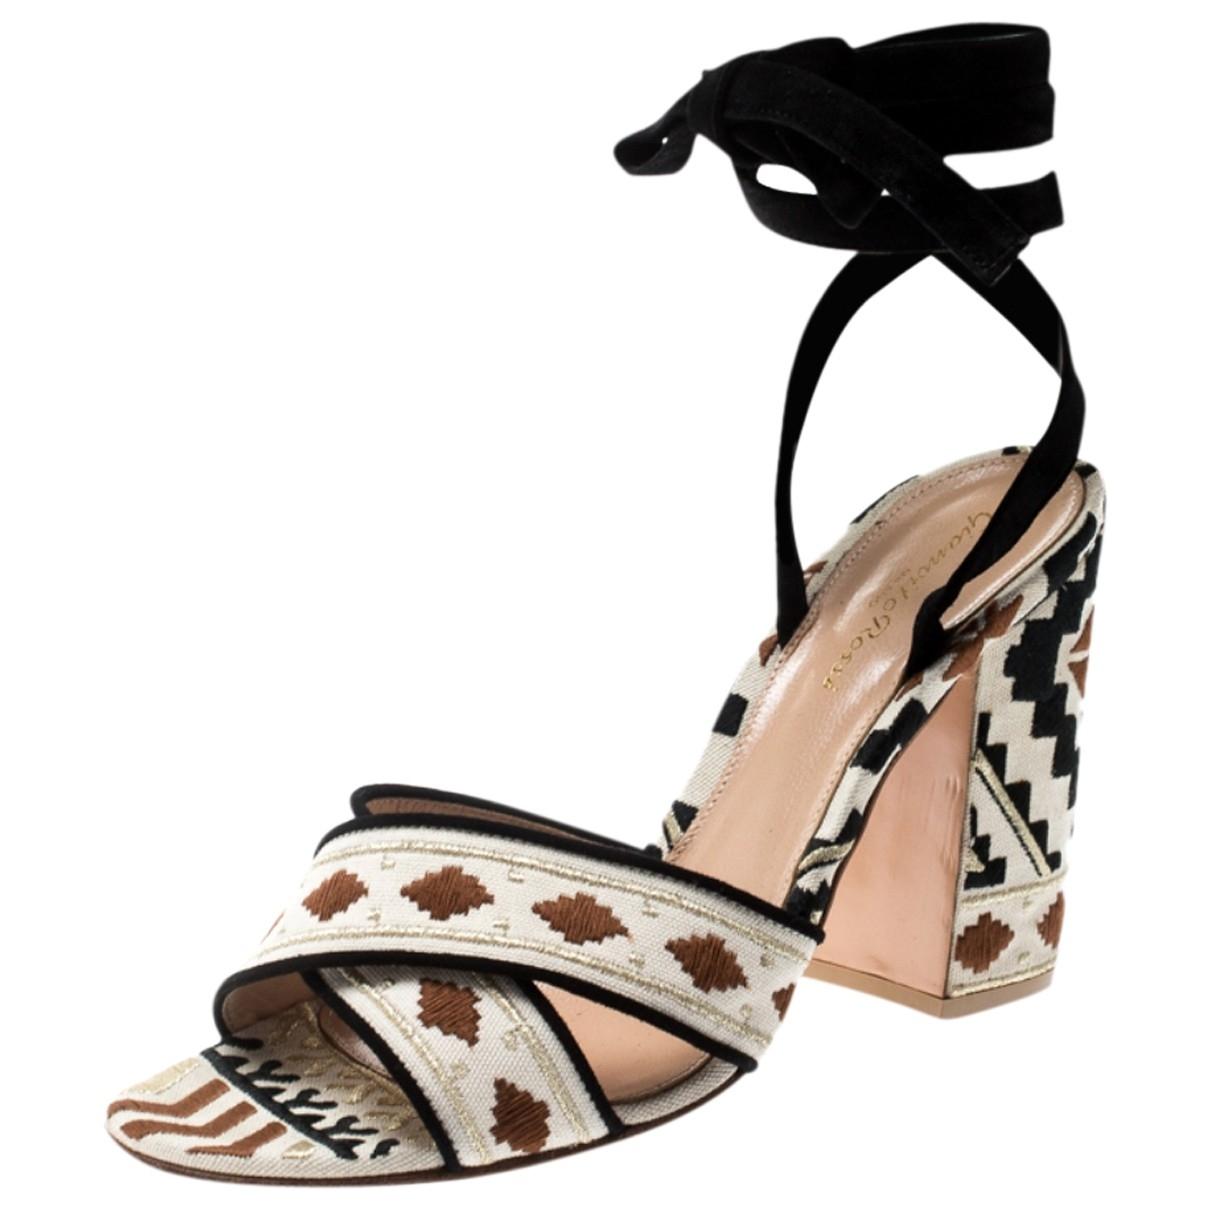 Gianvito Rossi \N Multicolour Suede Sandals for Women 39.5 EU